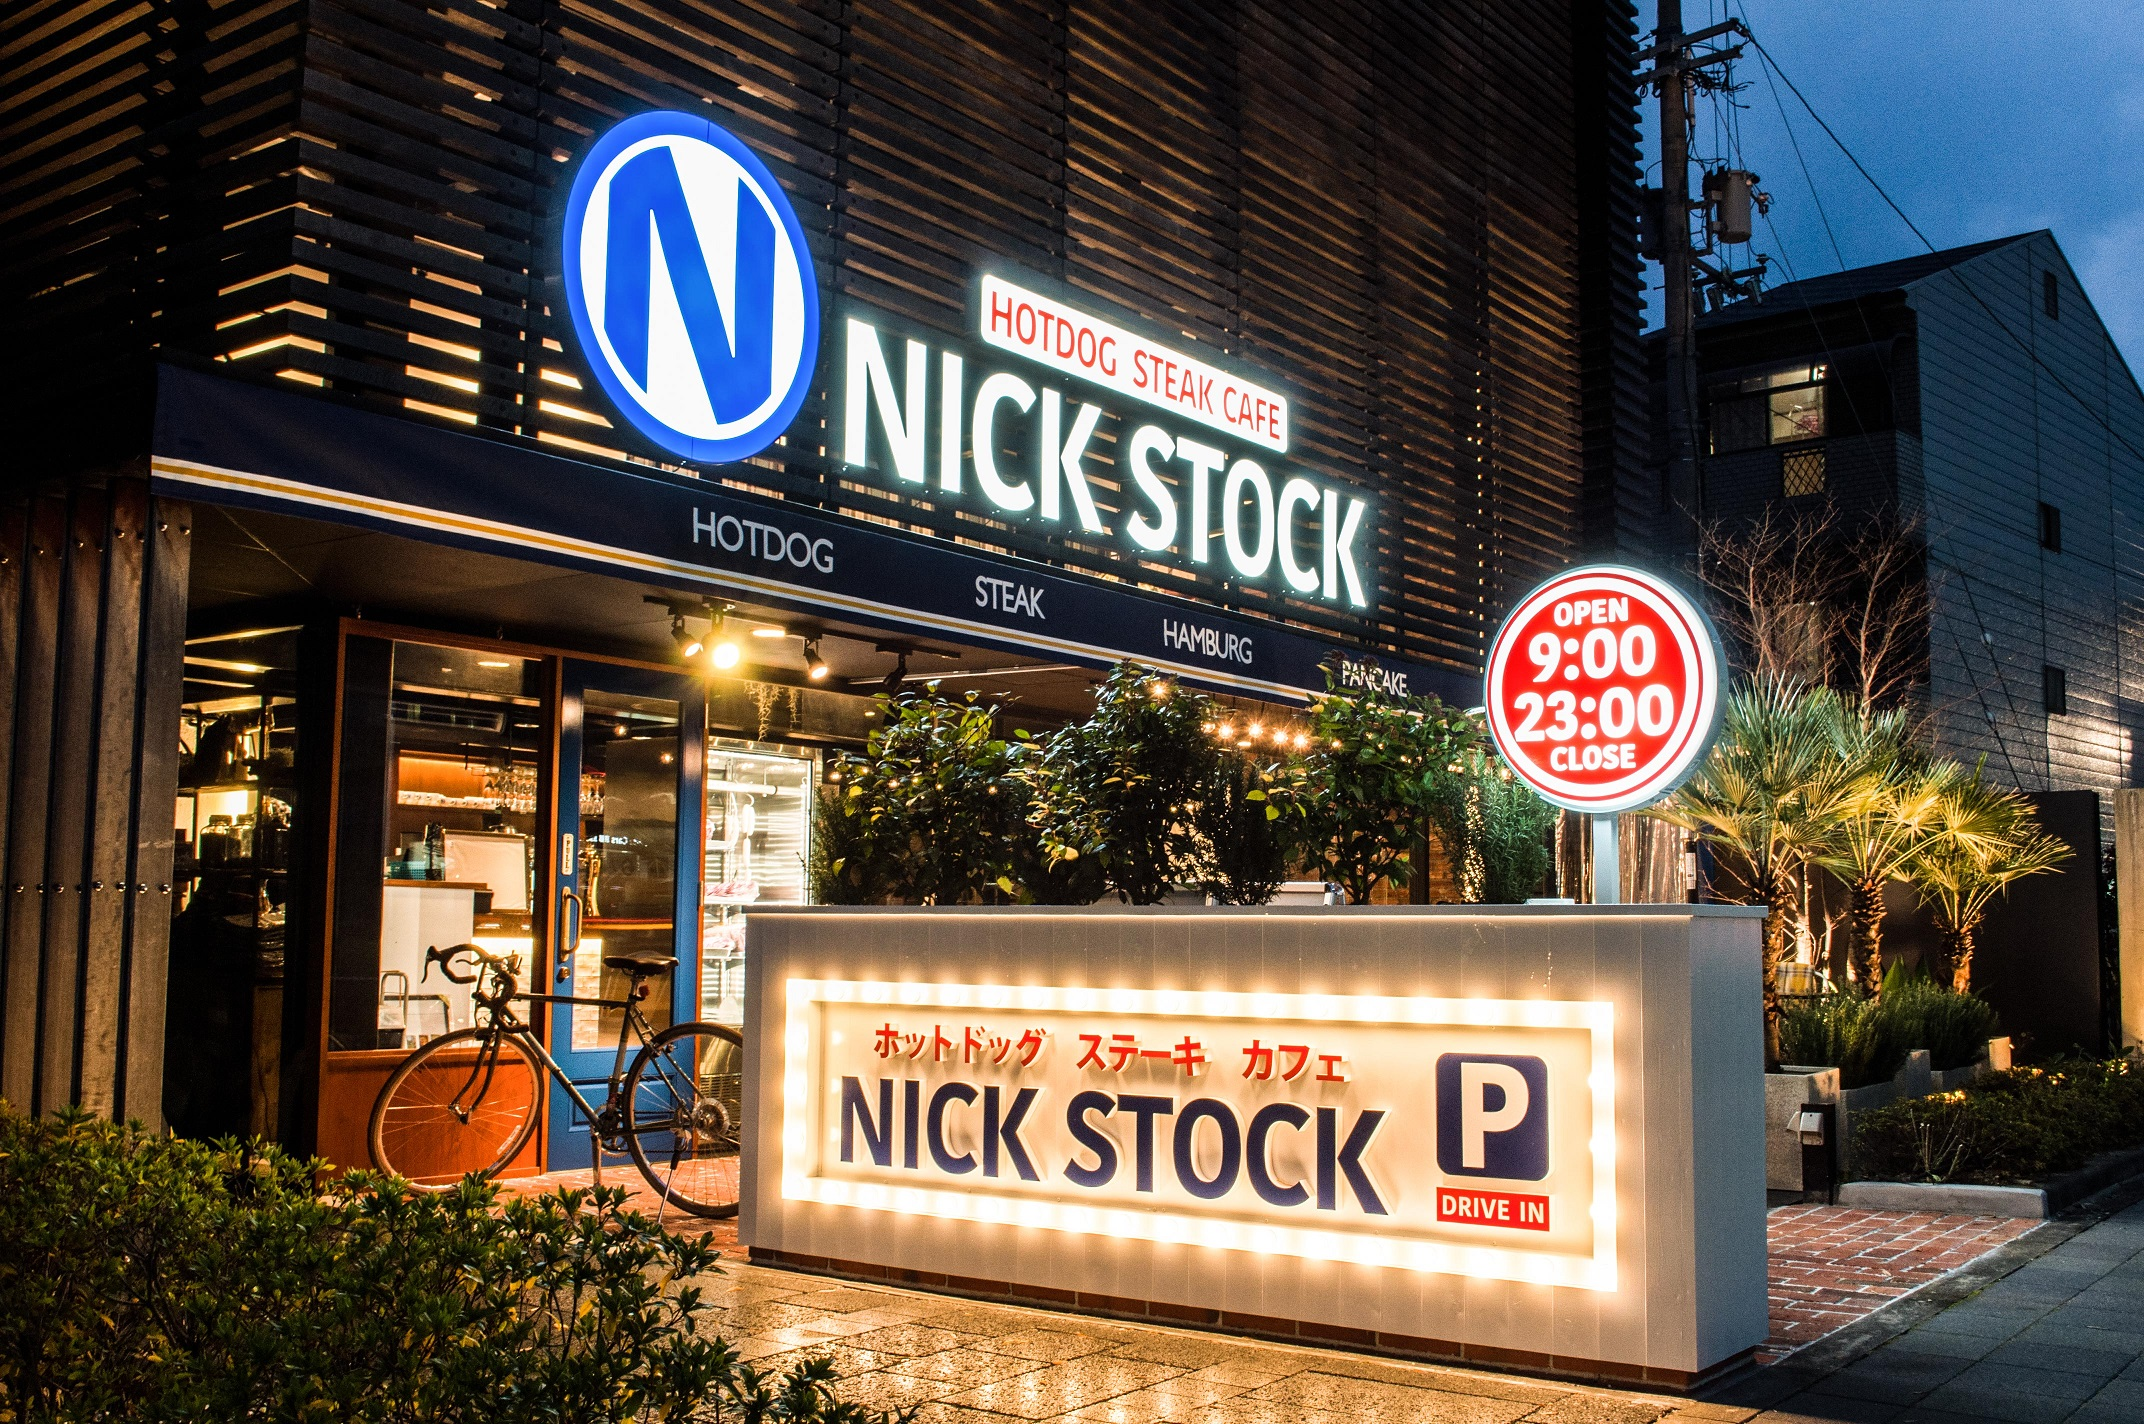 NICK STOCK 1号店(京都リサーチパーク店)外観